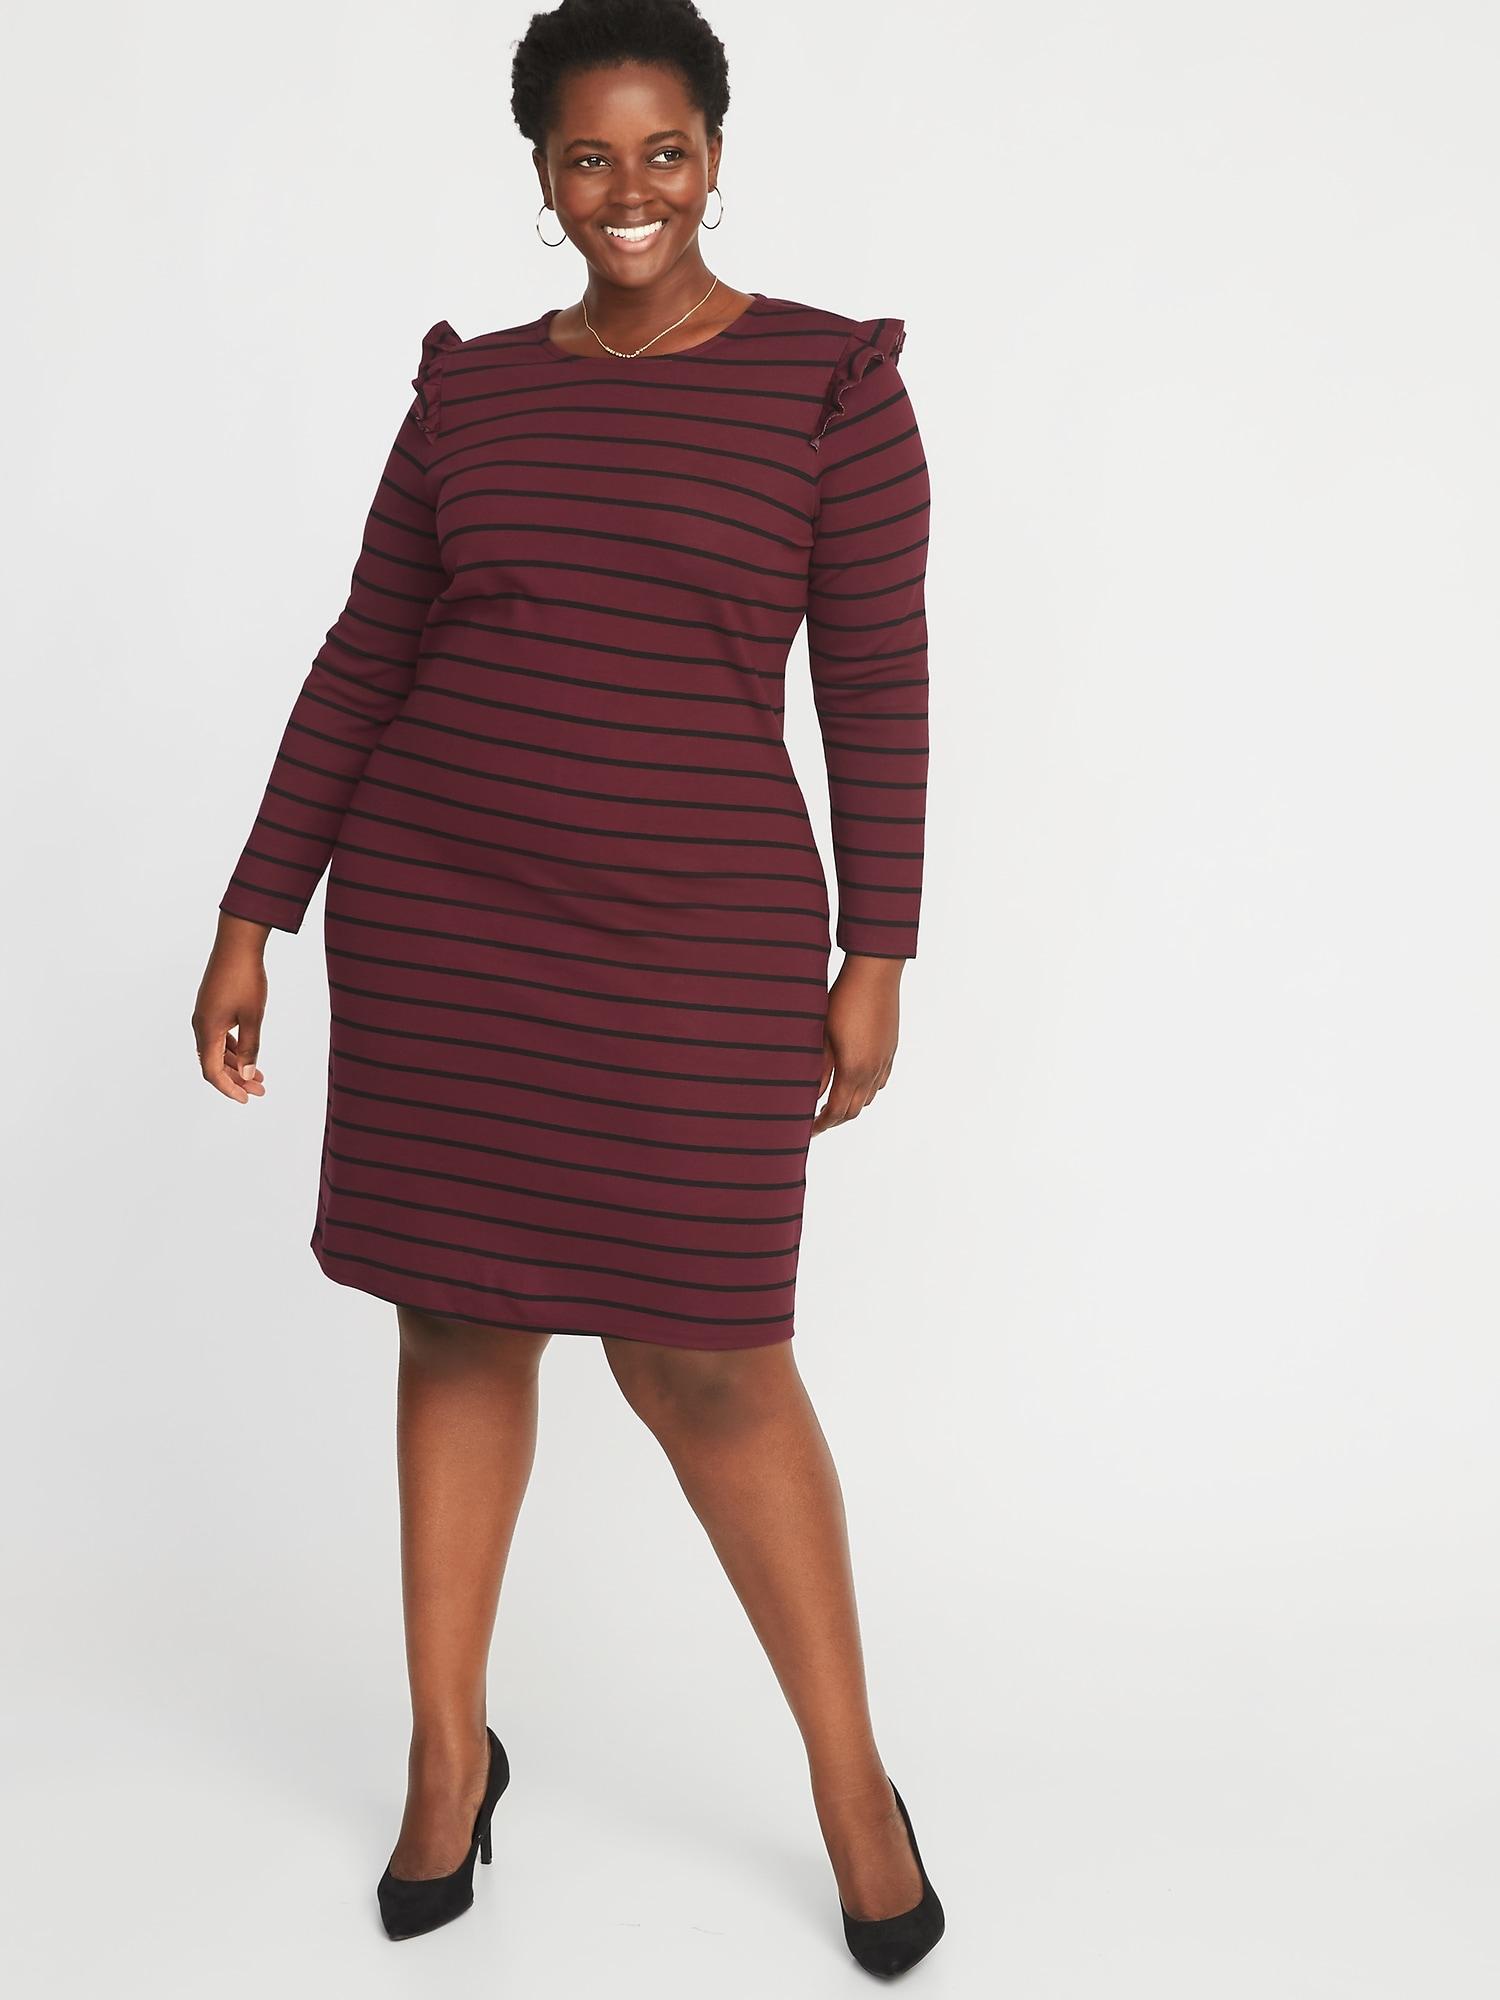 Plus-Size Ruffle-Trim Ponte-Knit Shift Dress | Old Navy